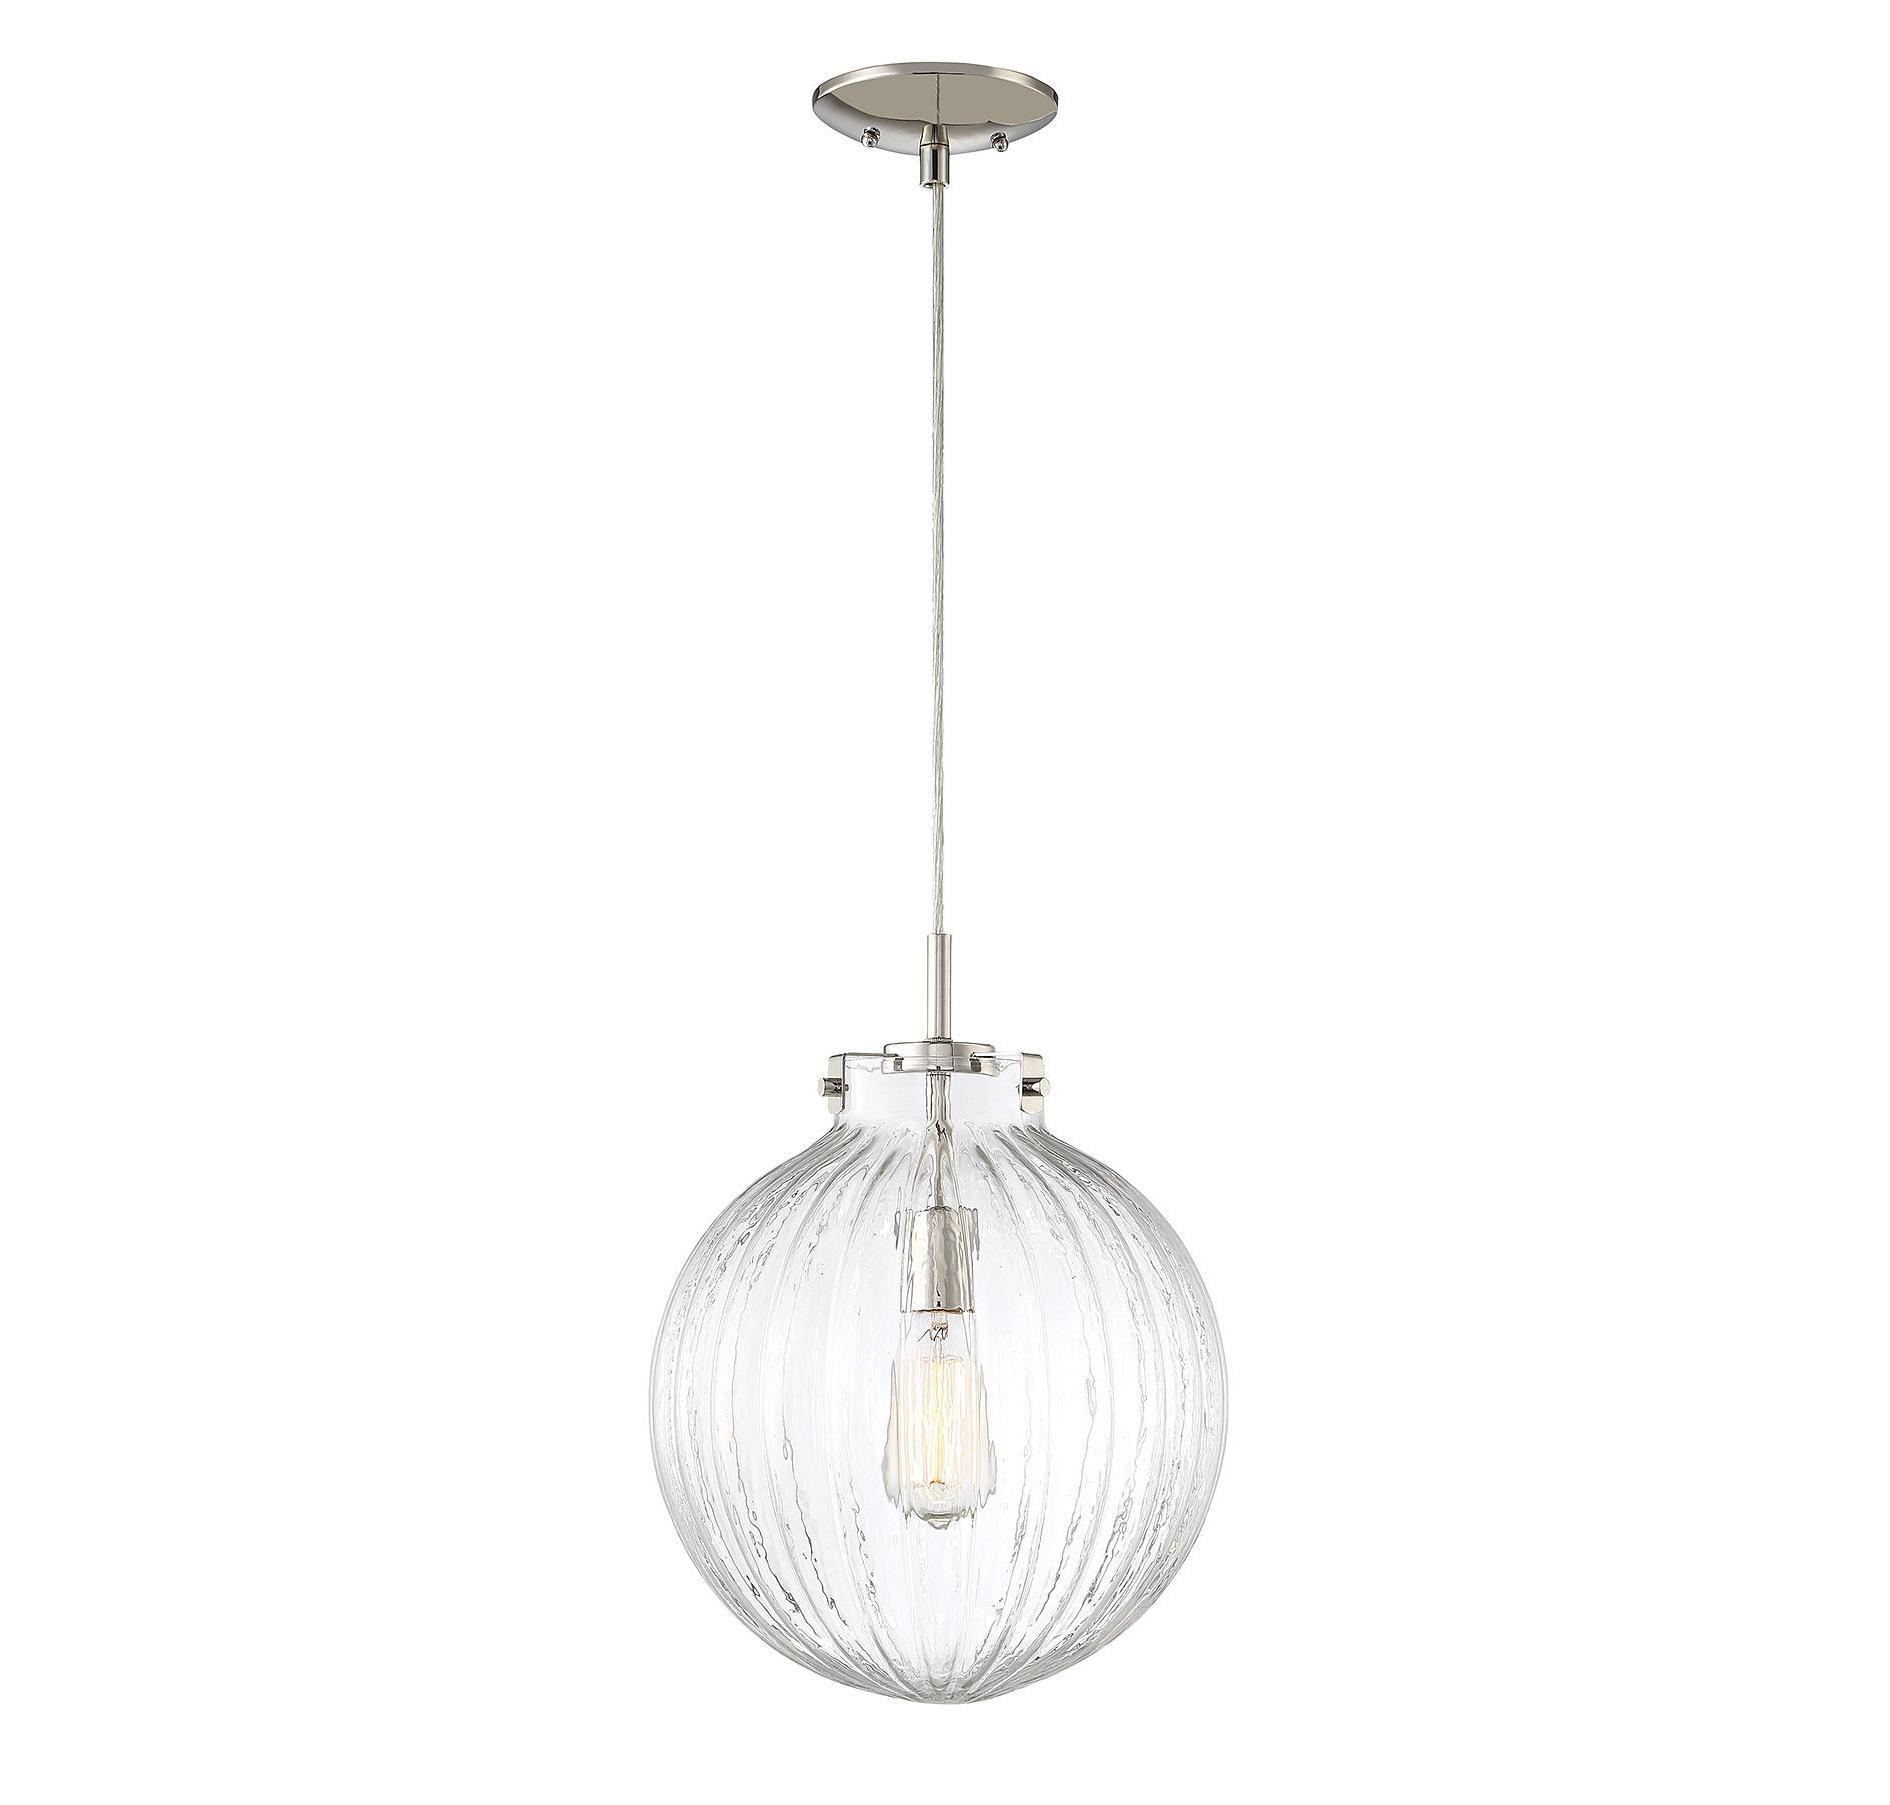 Widely Used Nevels 1 Light Single Globe Pendant Intended For Demi 1 Light Globe Pendants (View 19 of 20)